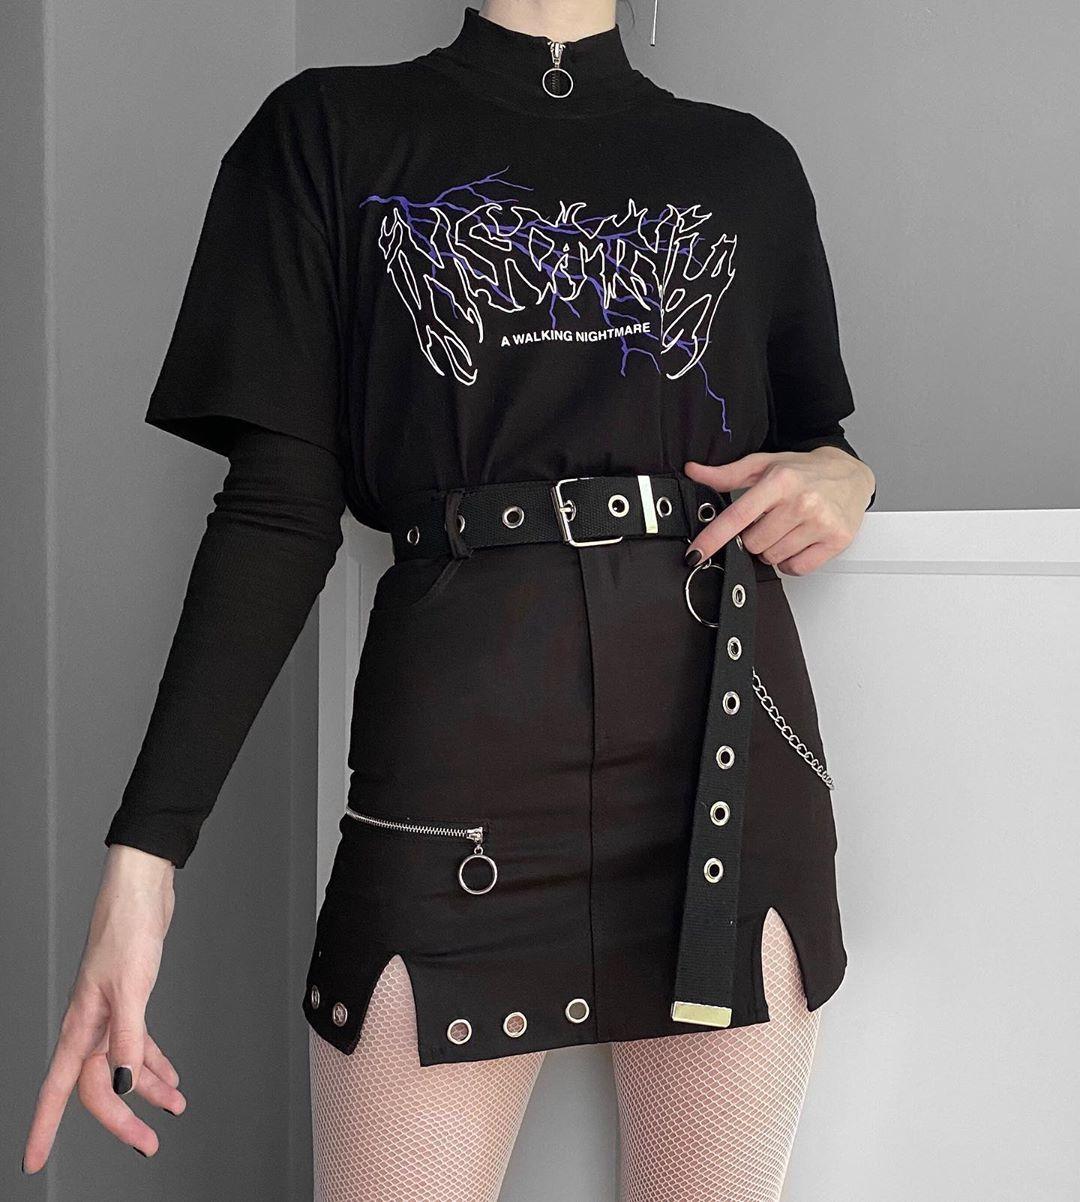 Insomnia Lightning Shirt – Aesthetic Shirt, Aesthetic Clothing, Grunge Shirt, Grunge Clothing Tumblr Clothing, Tumblr Shirt, Grunge, Y2K